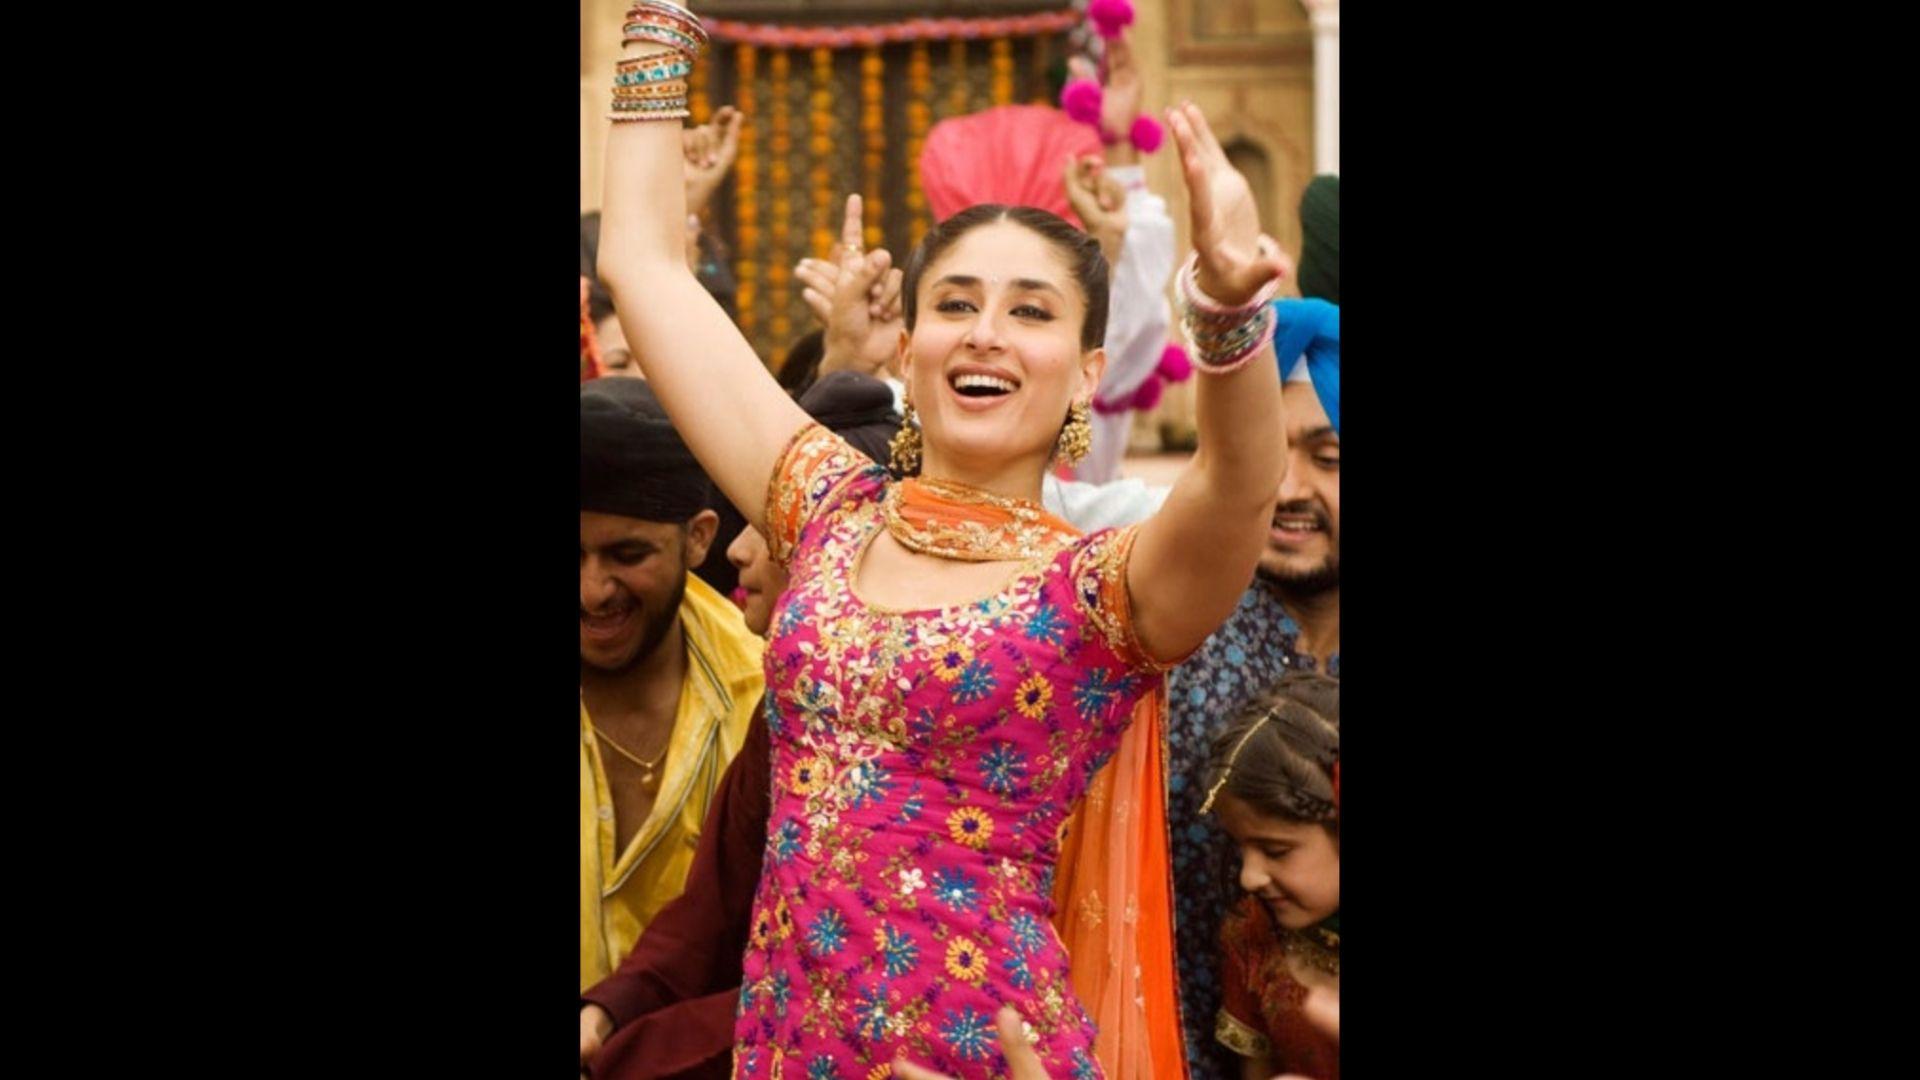 Kareena Kapoor Khan Gets Spotted At Inaaya's Birthday Bash; Her Look Reminds Us Of Geet From Jab We Met